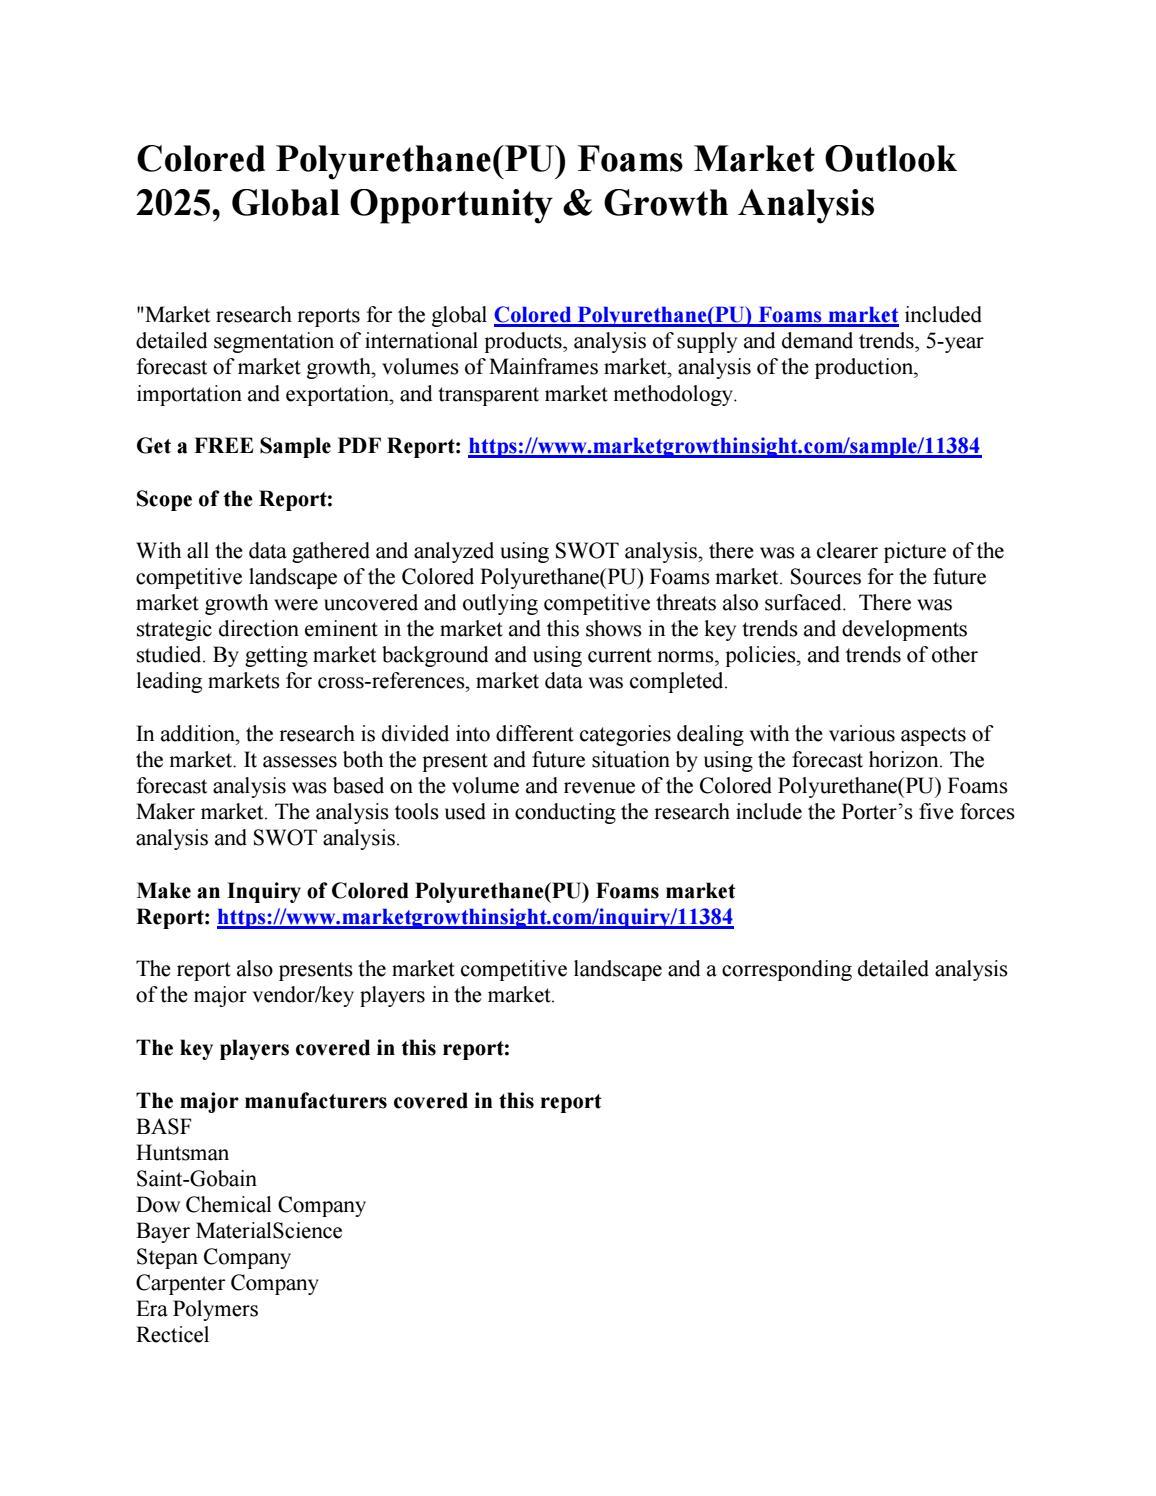 Colored Polyurethane(PU) Foams Market Outlook 2025, Global